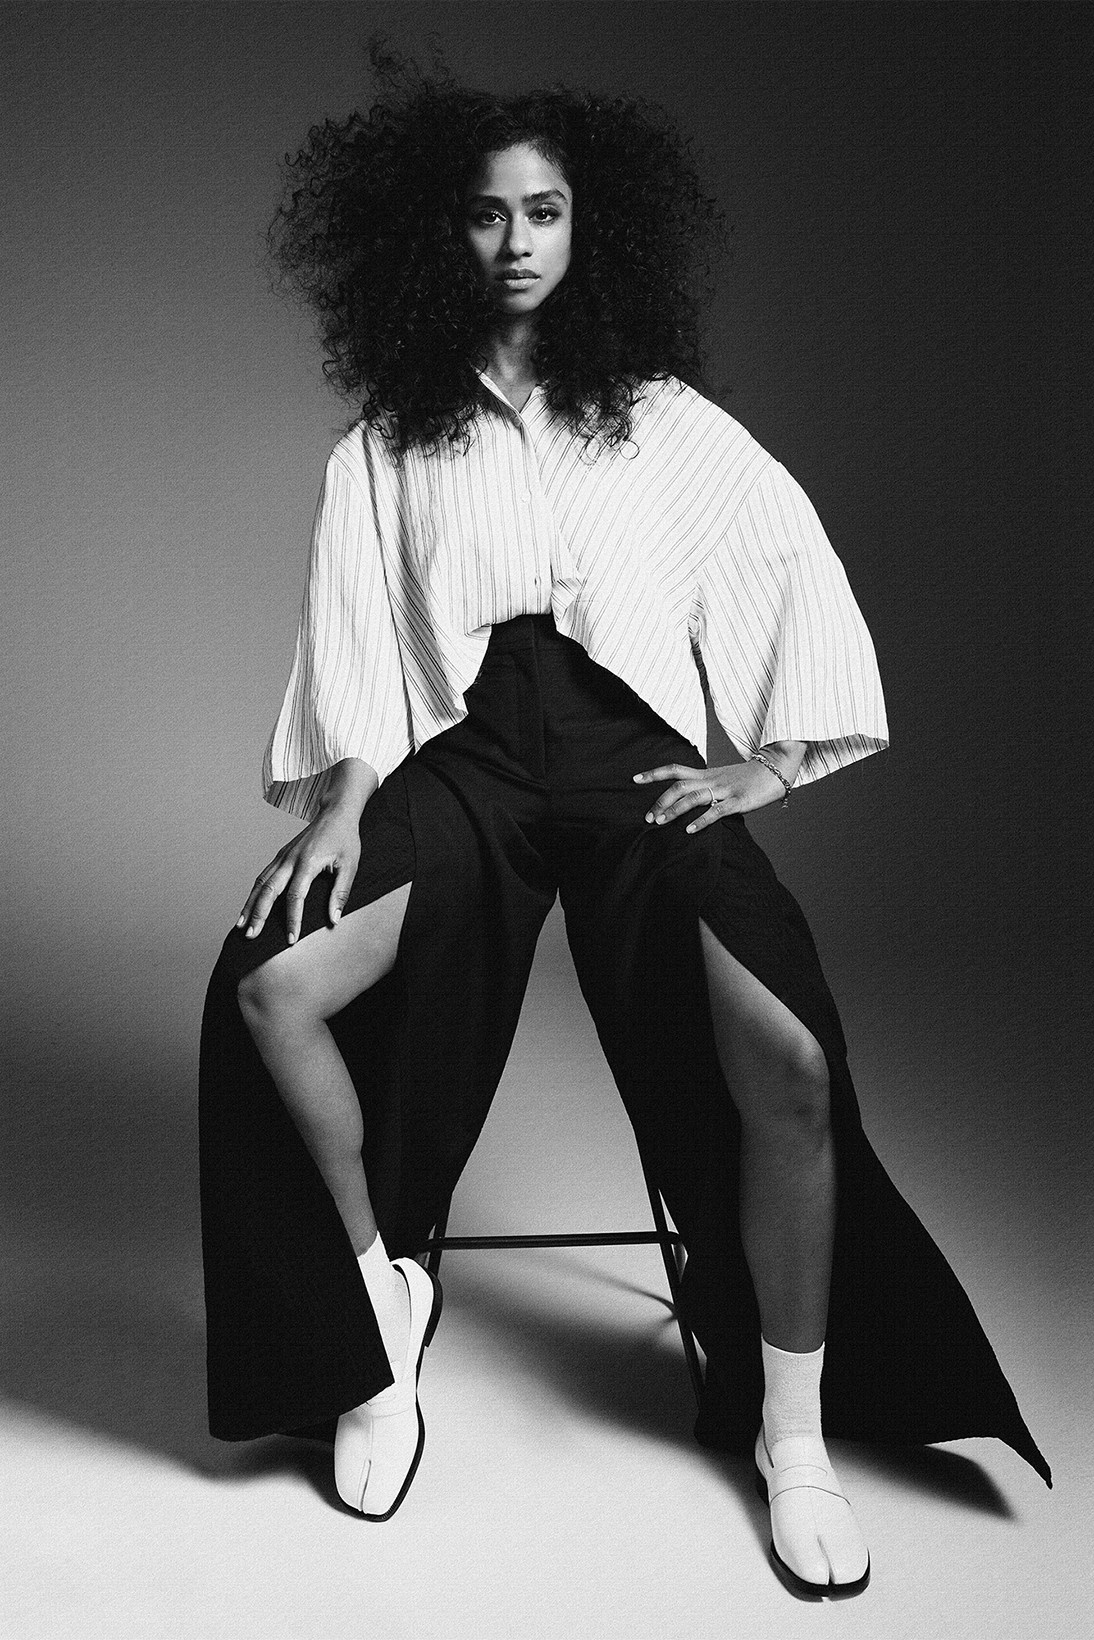 DJ Designer Violette Director Vashtie Kola Marine Serre Jacket Nanushka Tank Top Shorts Danielle Cathari Sweater Bottega Veneta